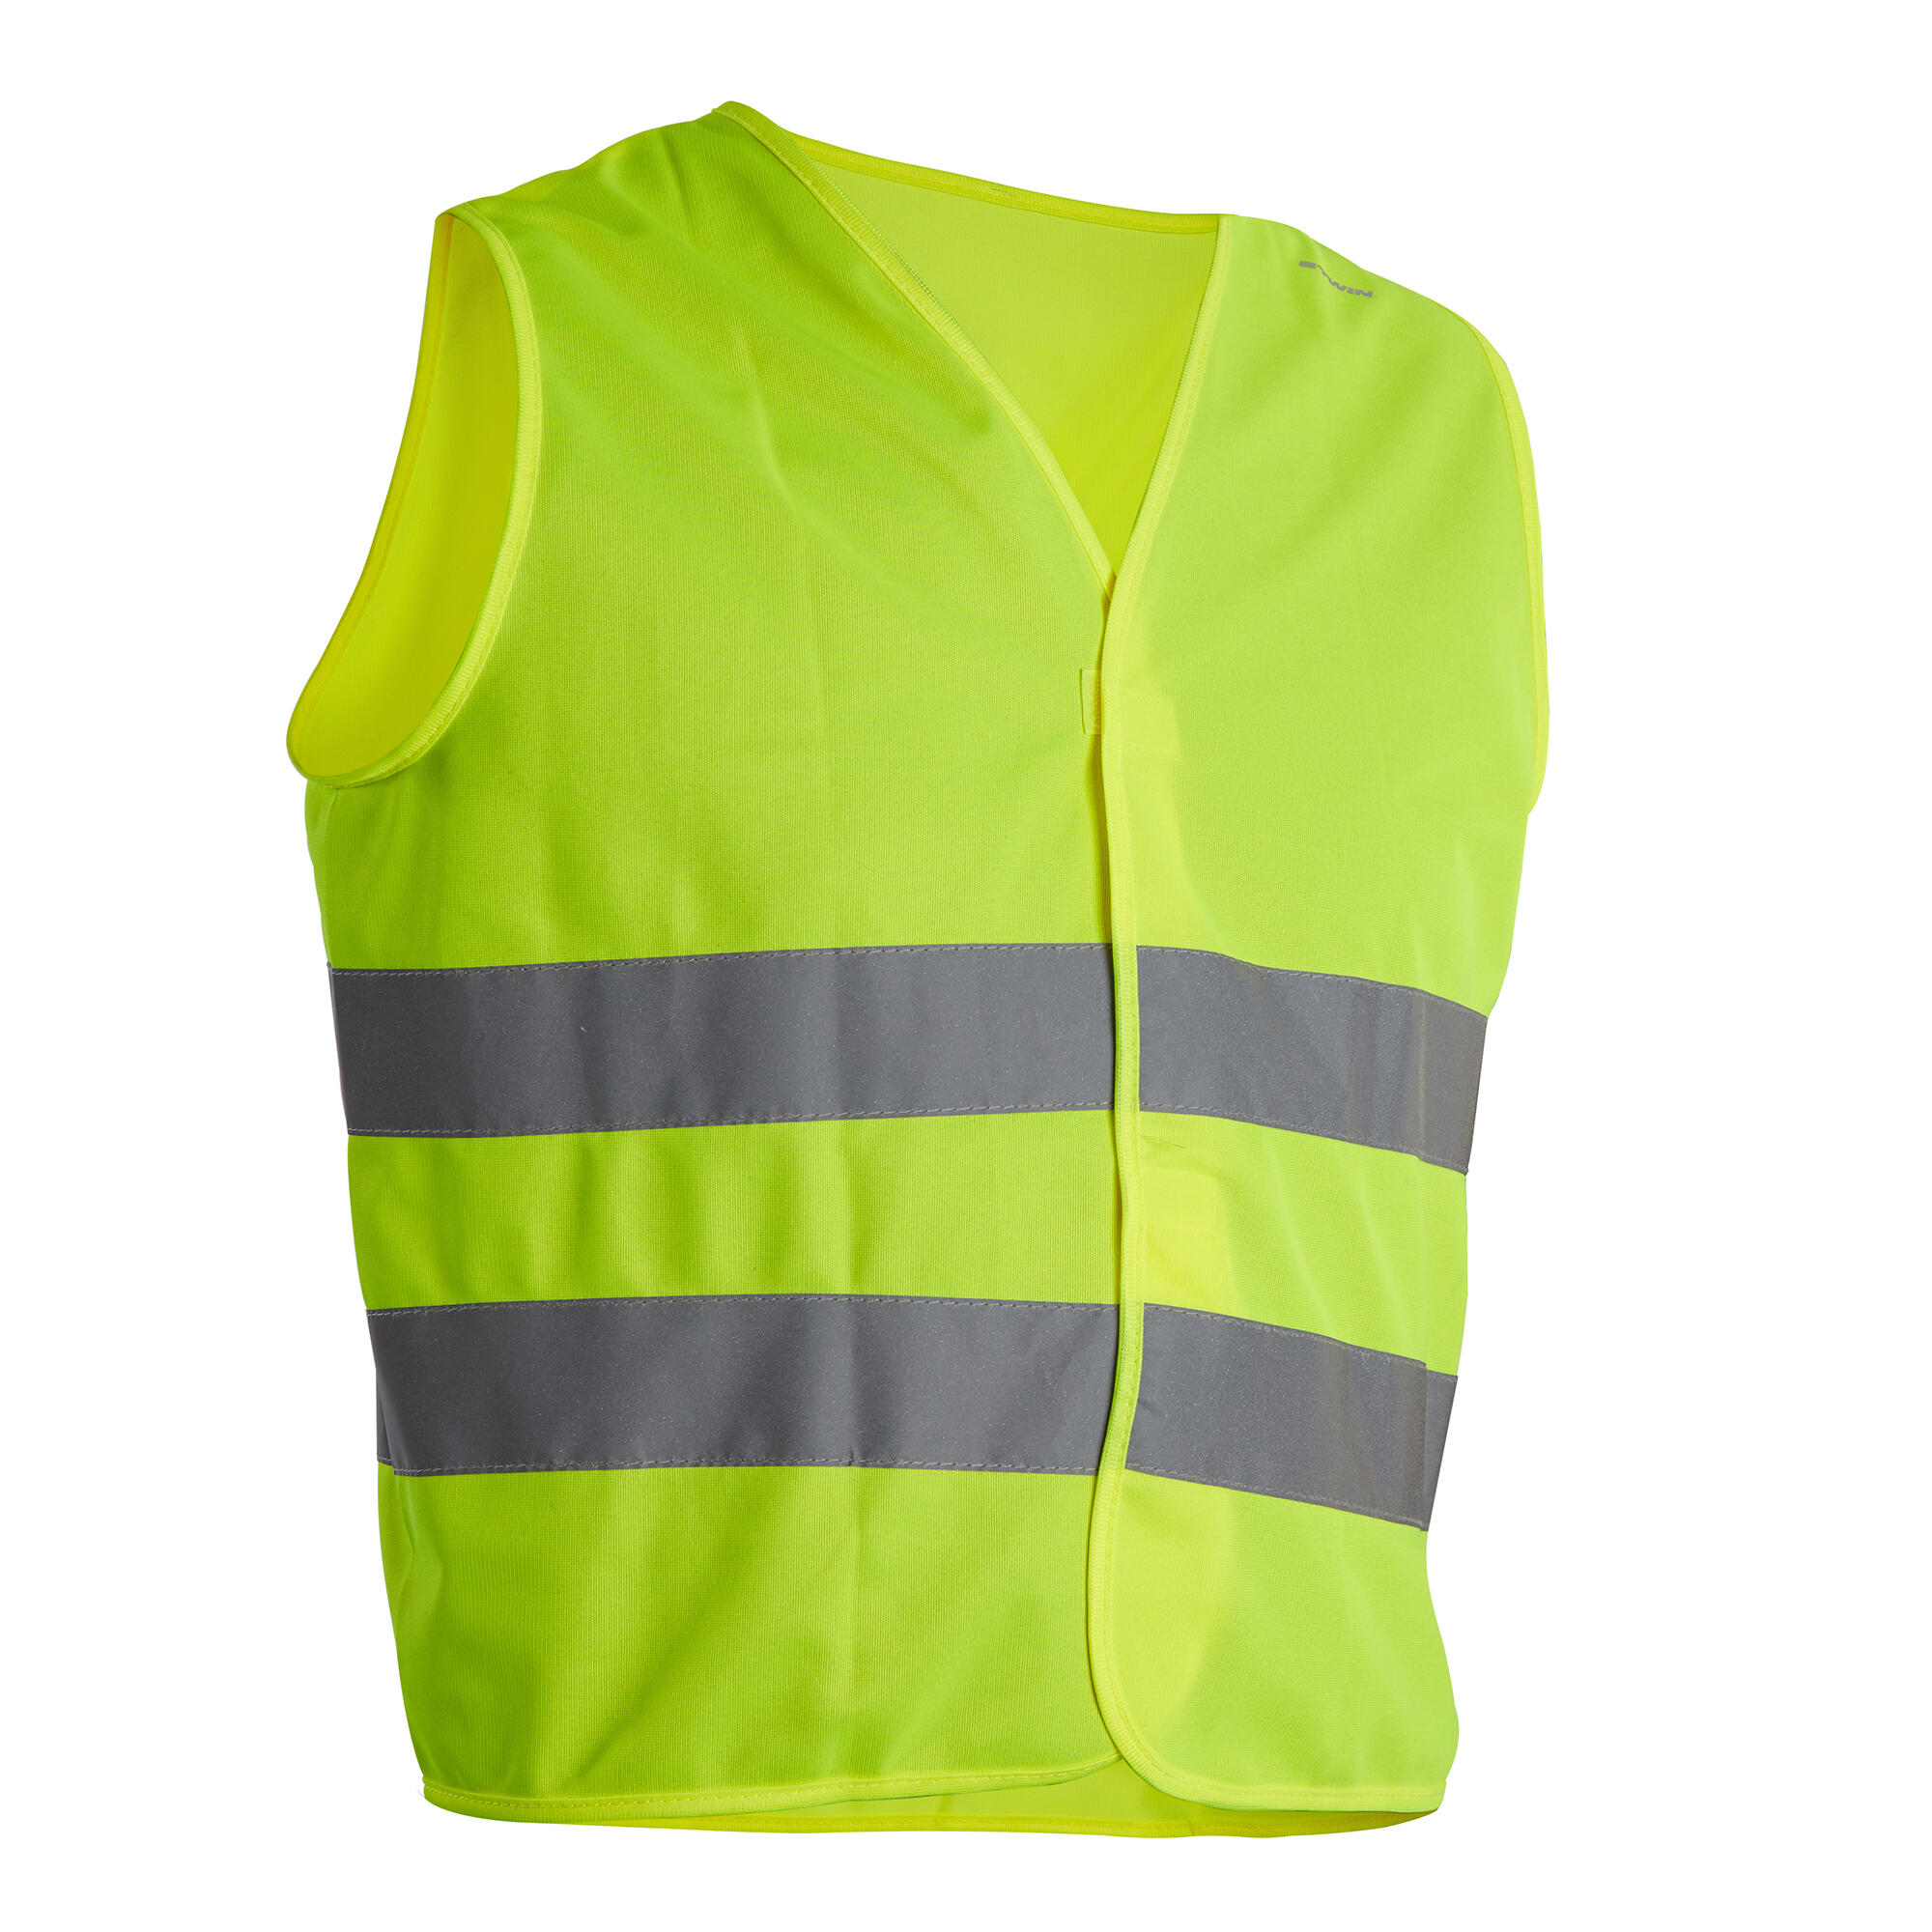 Kids' High-Visibility Vest